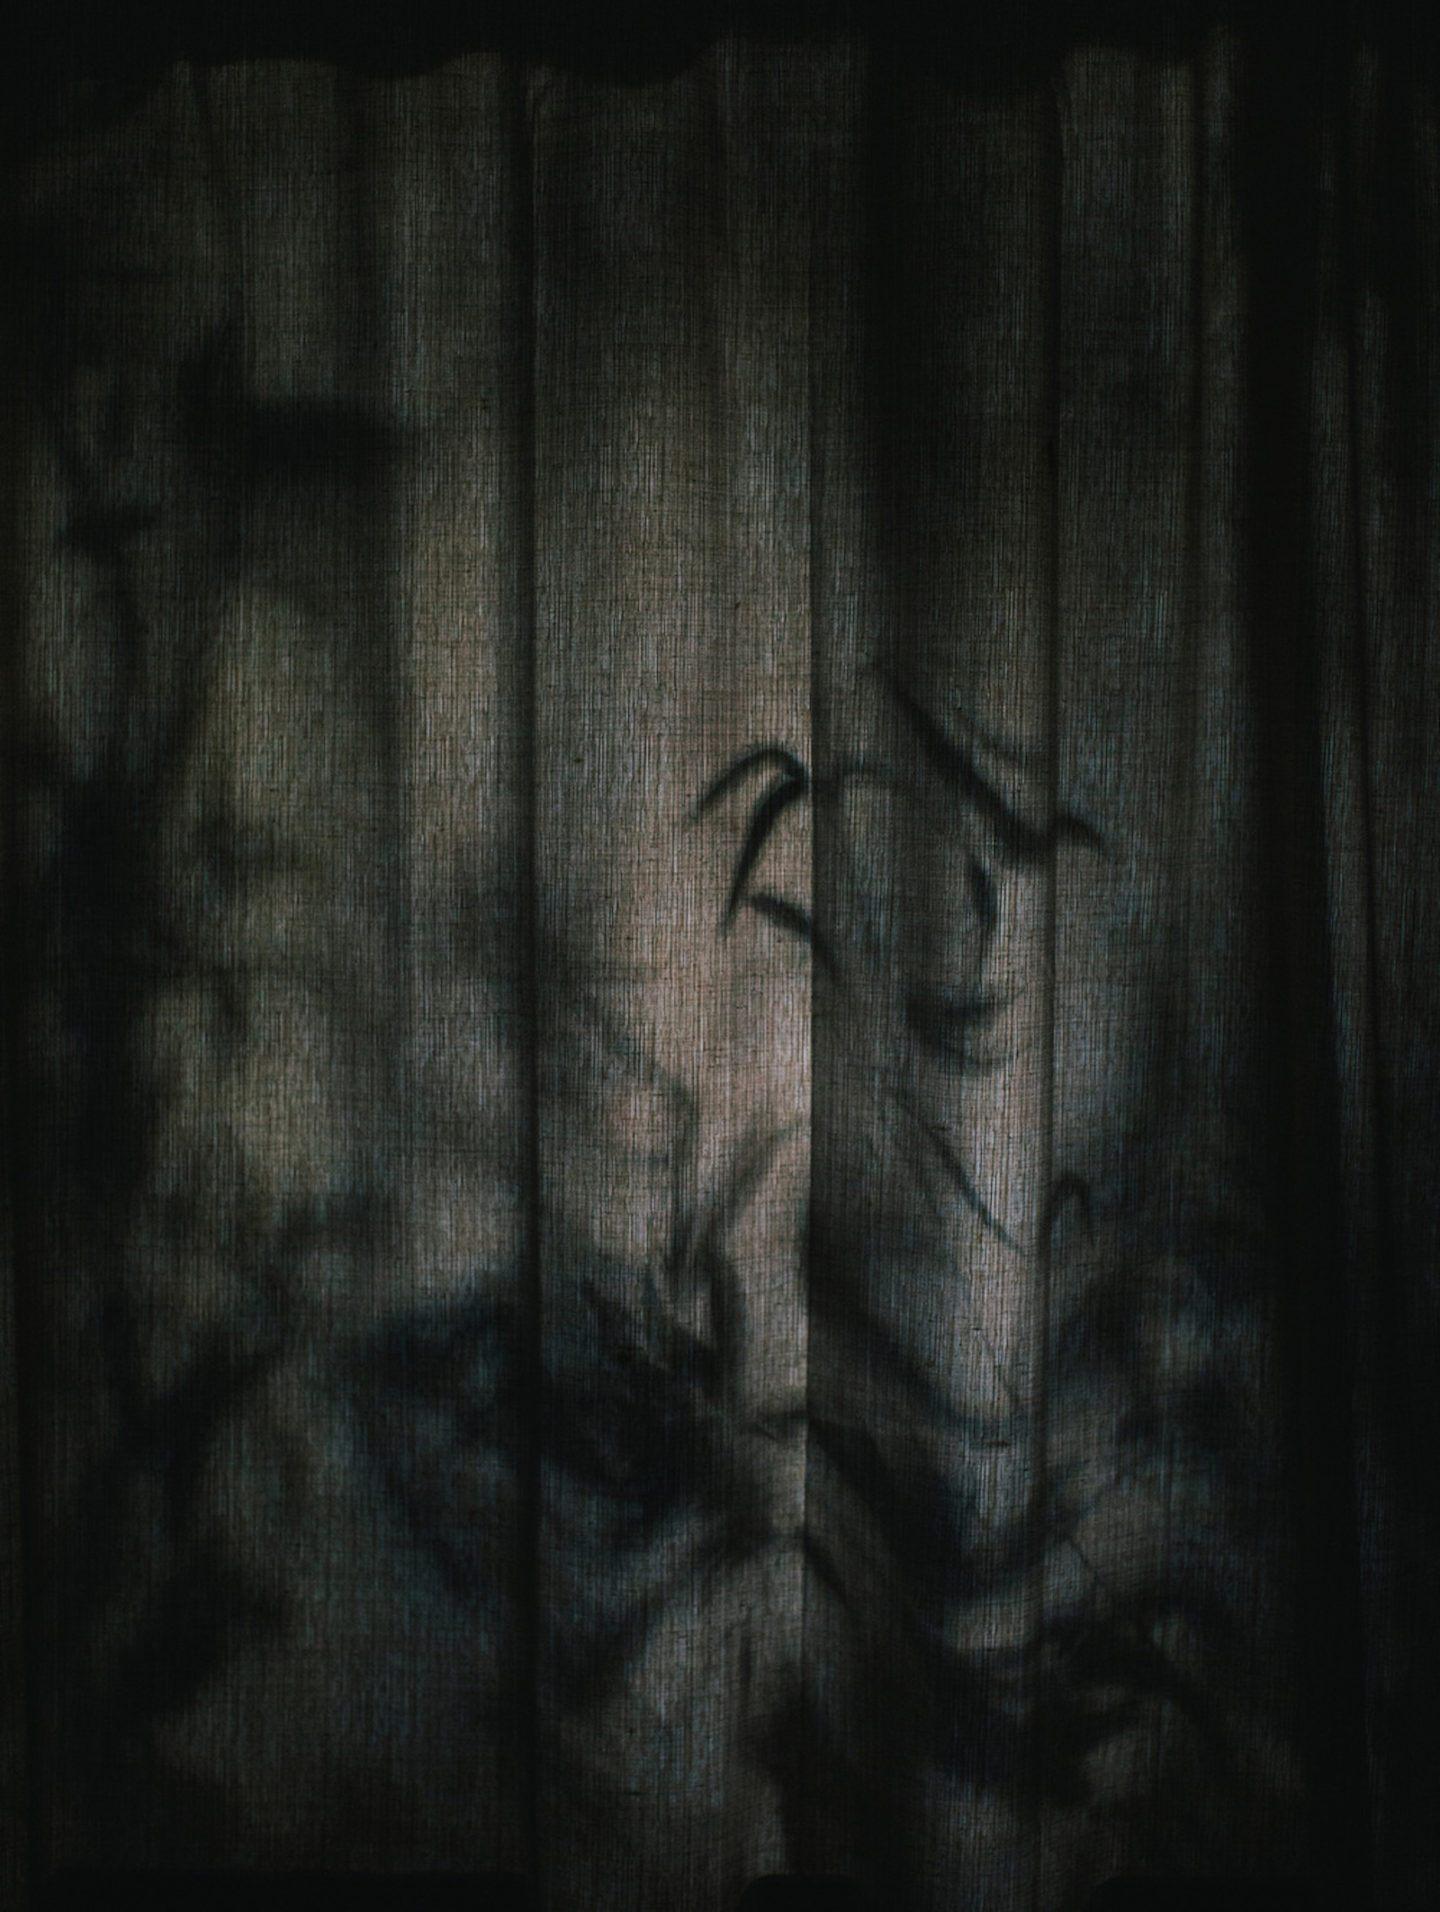 IGNANT-Photography-Chiara-Zonca-It-Devours-004